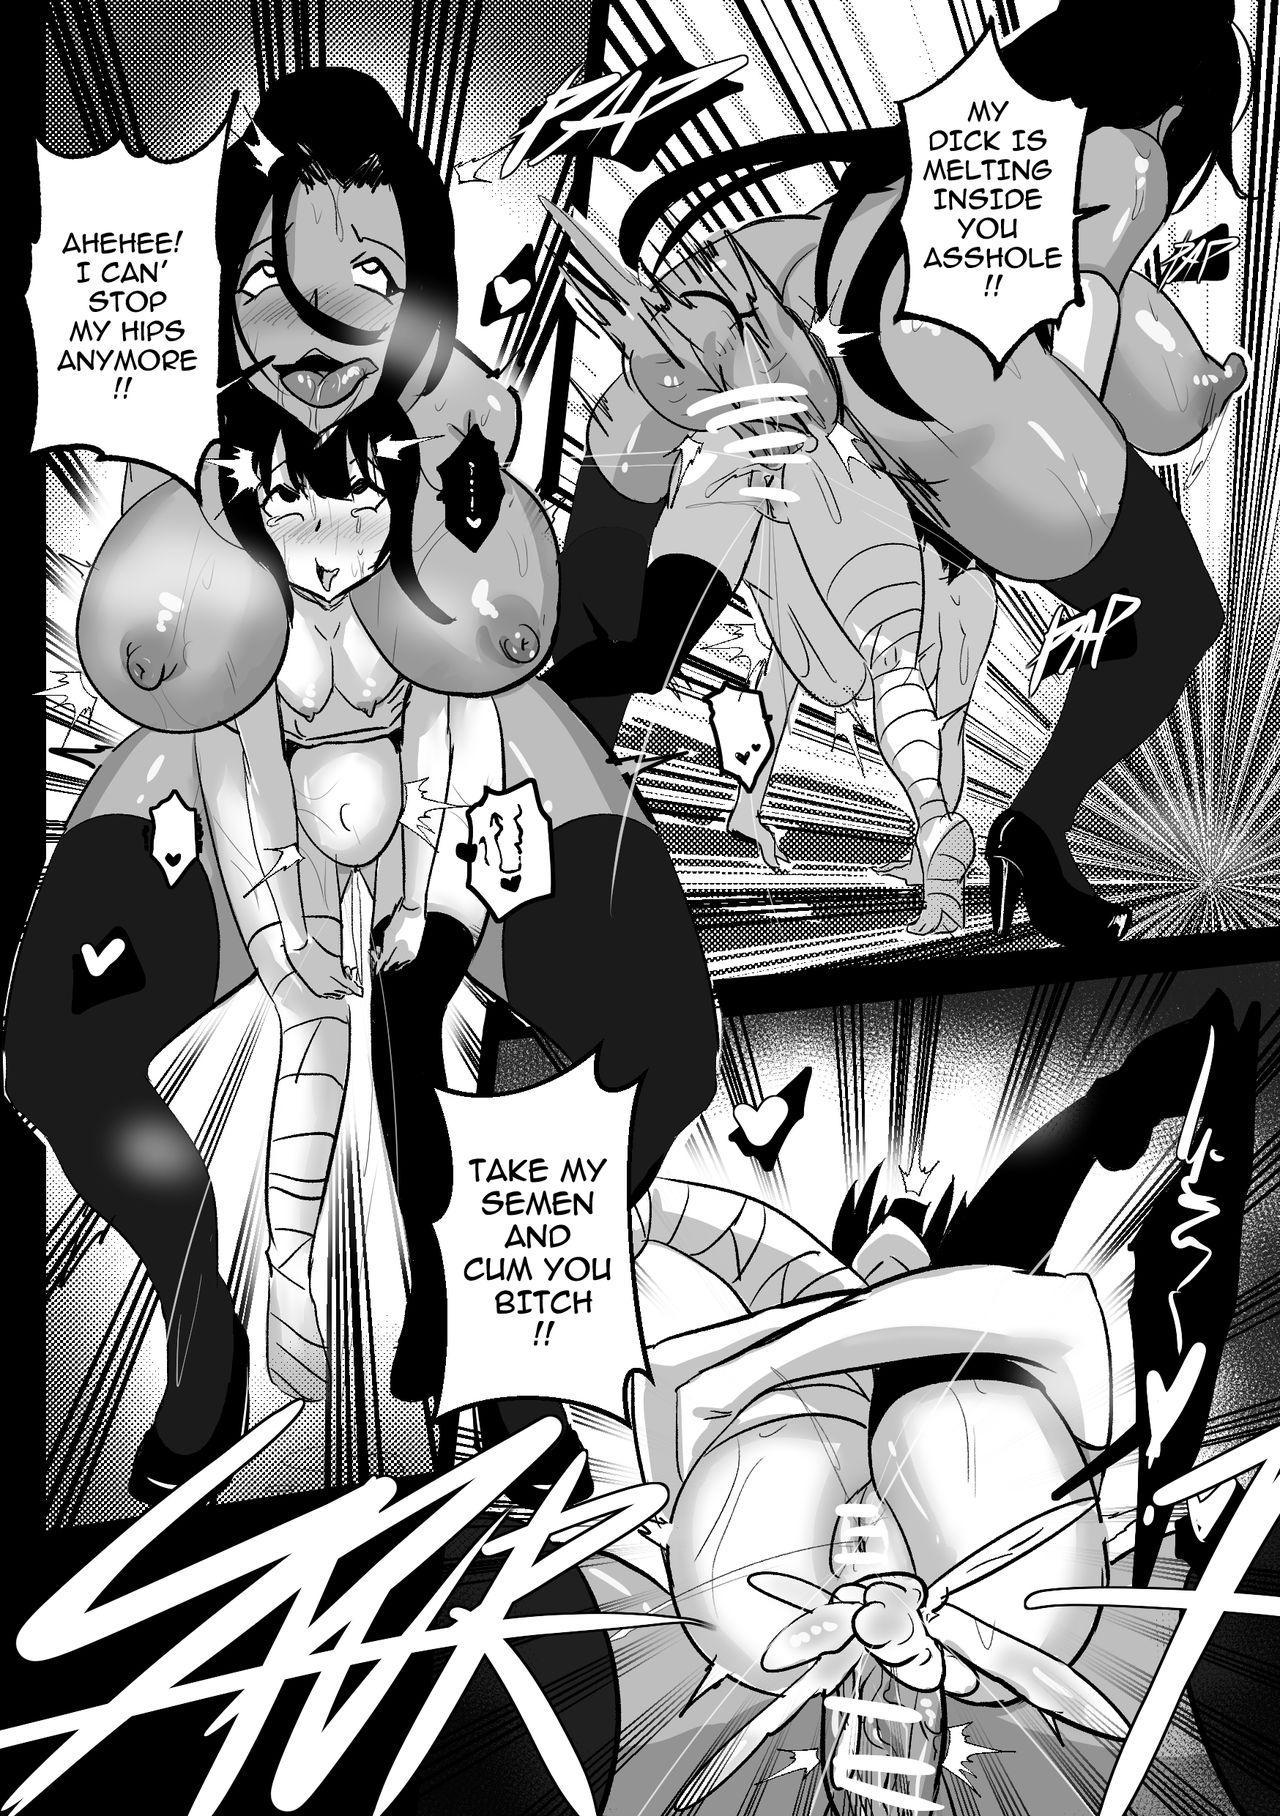 B-Trayal 29 Sylvia(kunosuba) Censored (EN) 11